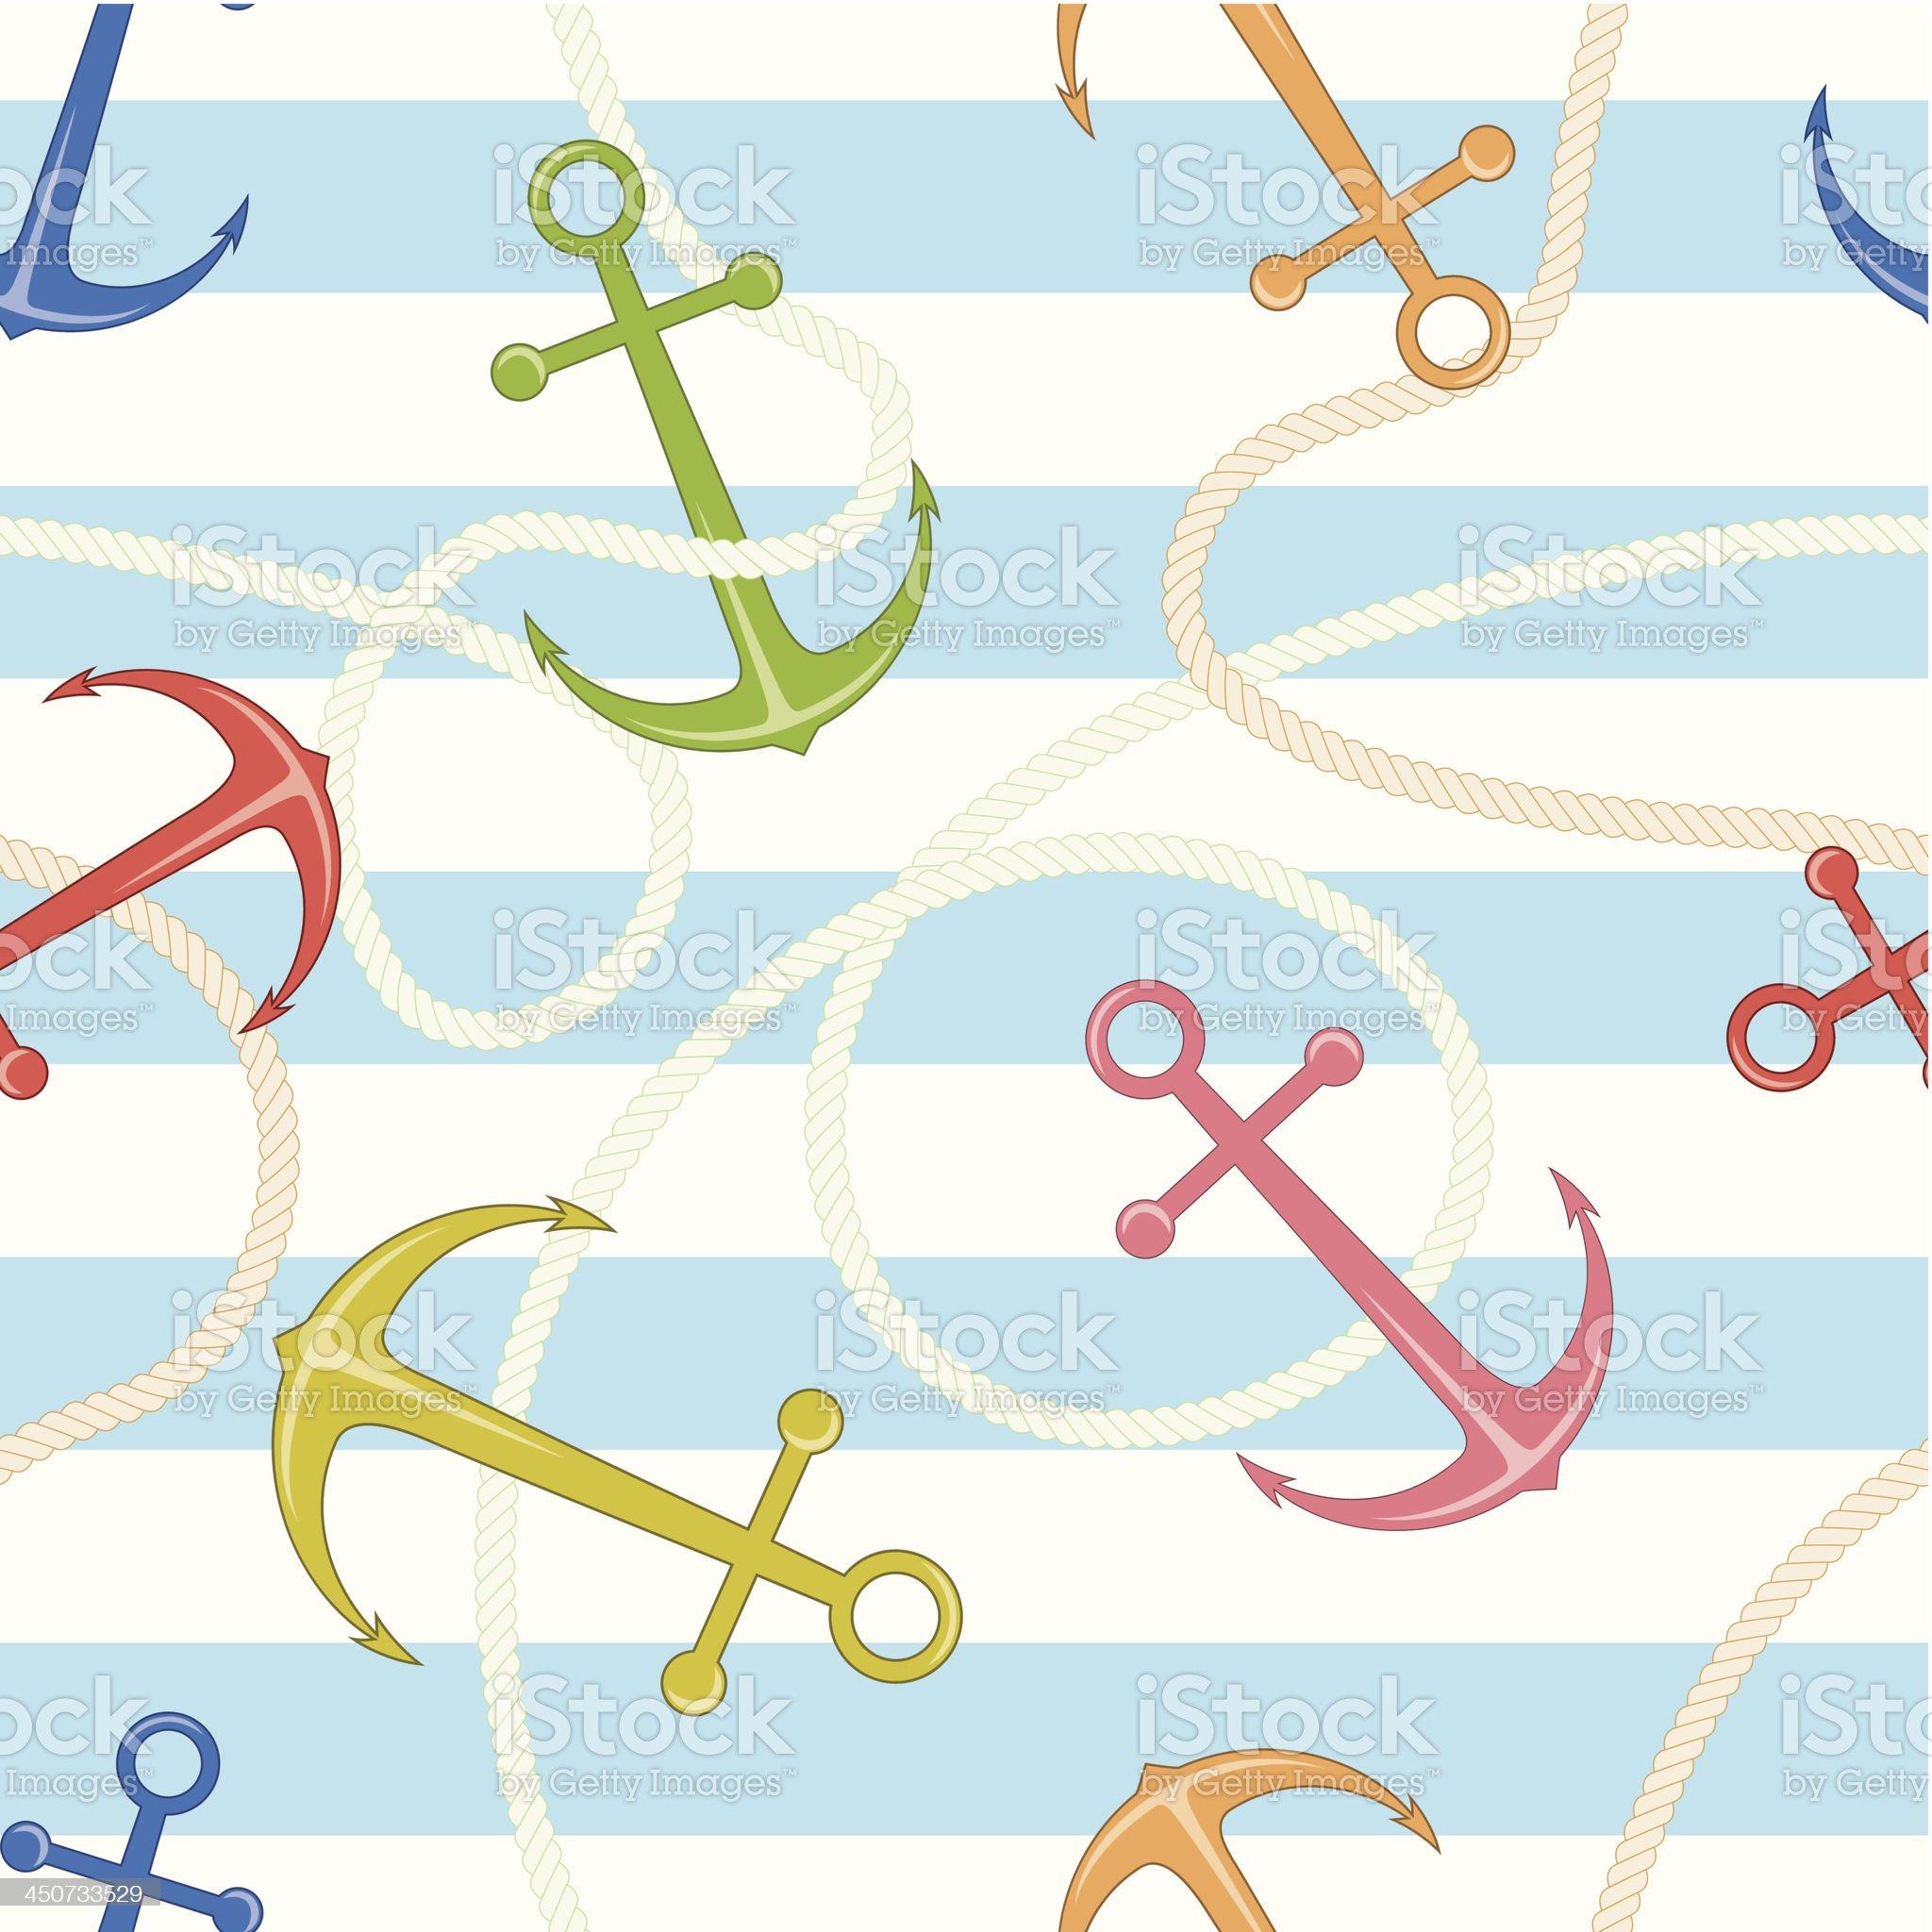 Anchors pattern royalty-free stock vector art